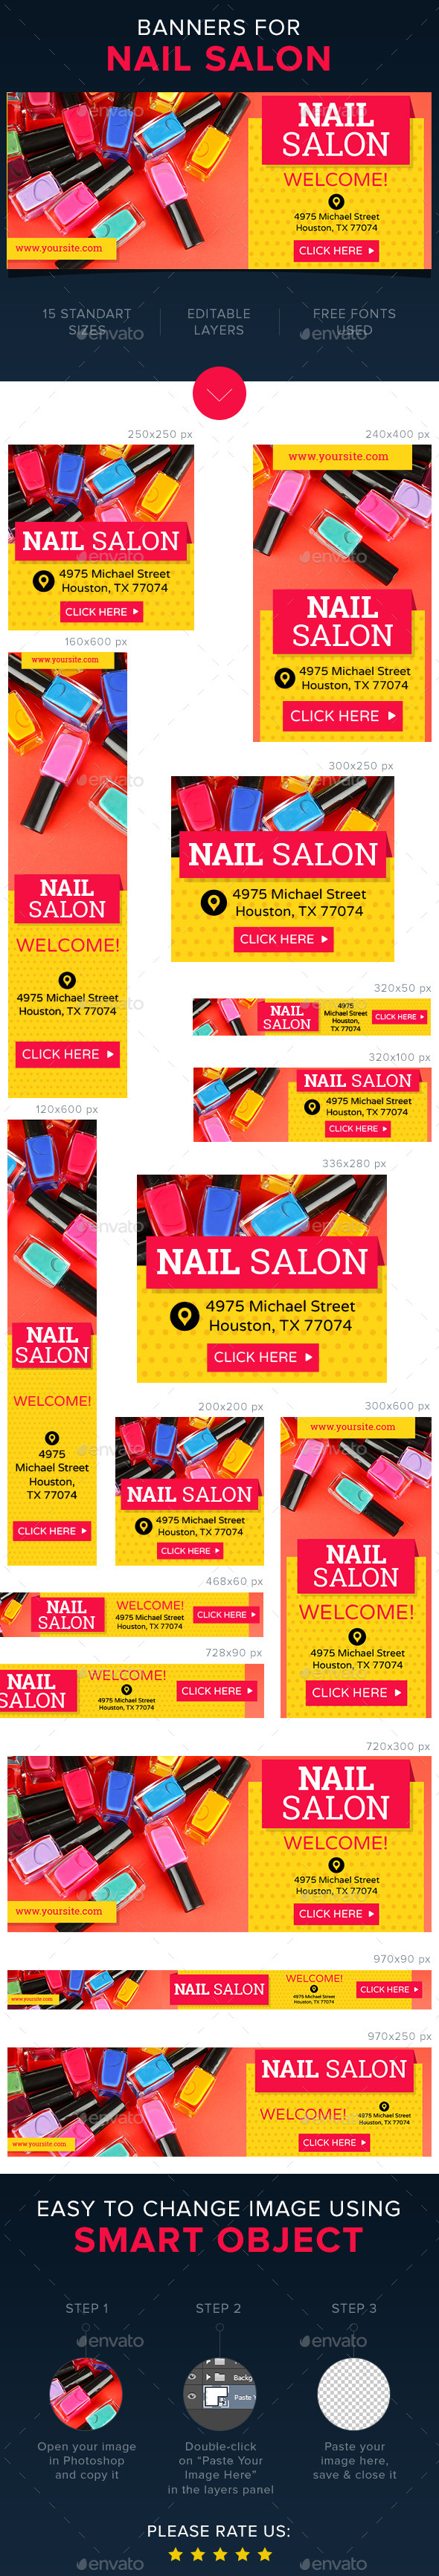 Nail Salon Banners